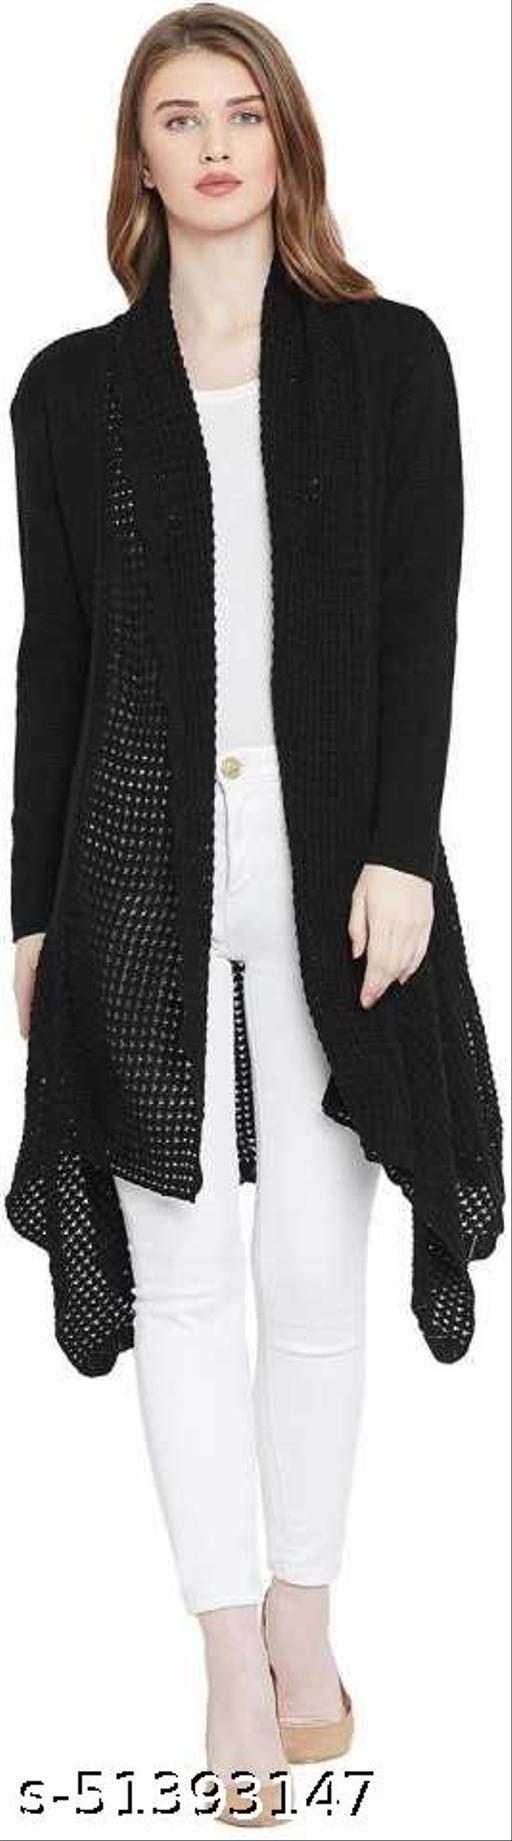 Urbane Fashionista Women Sweaters